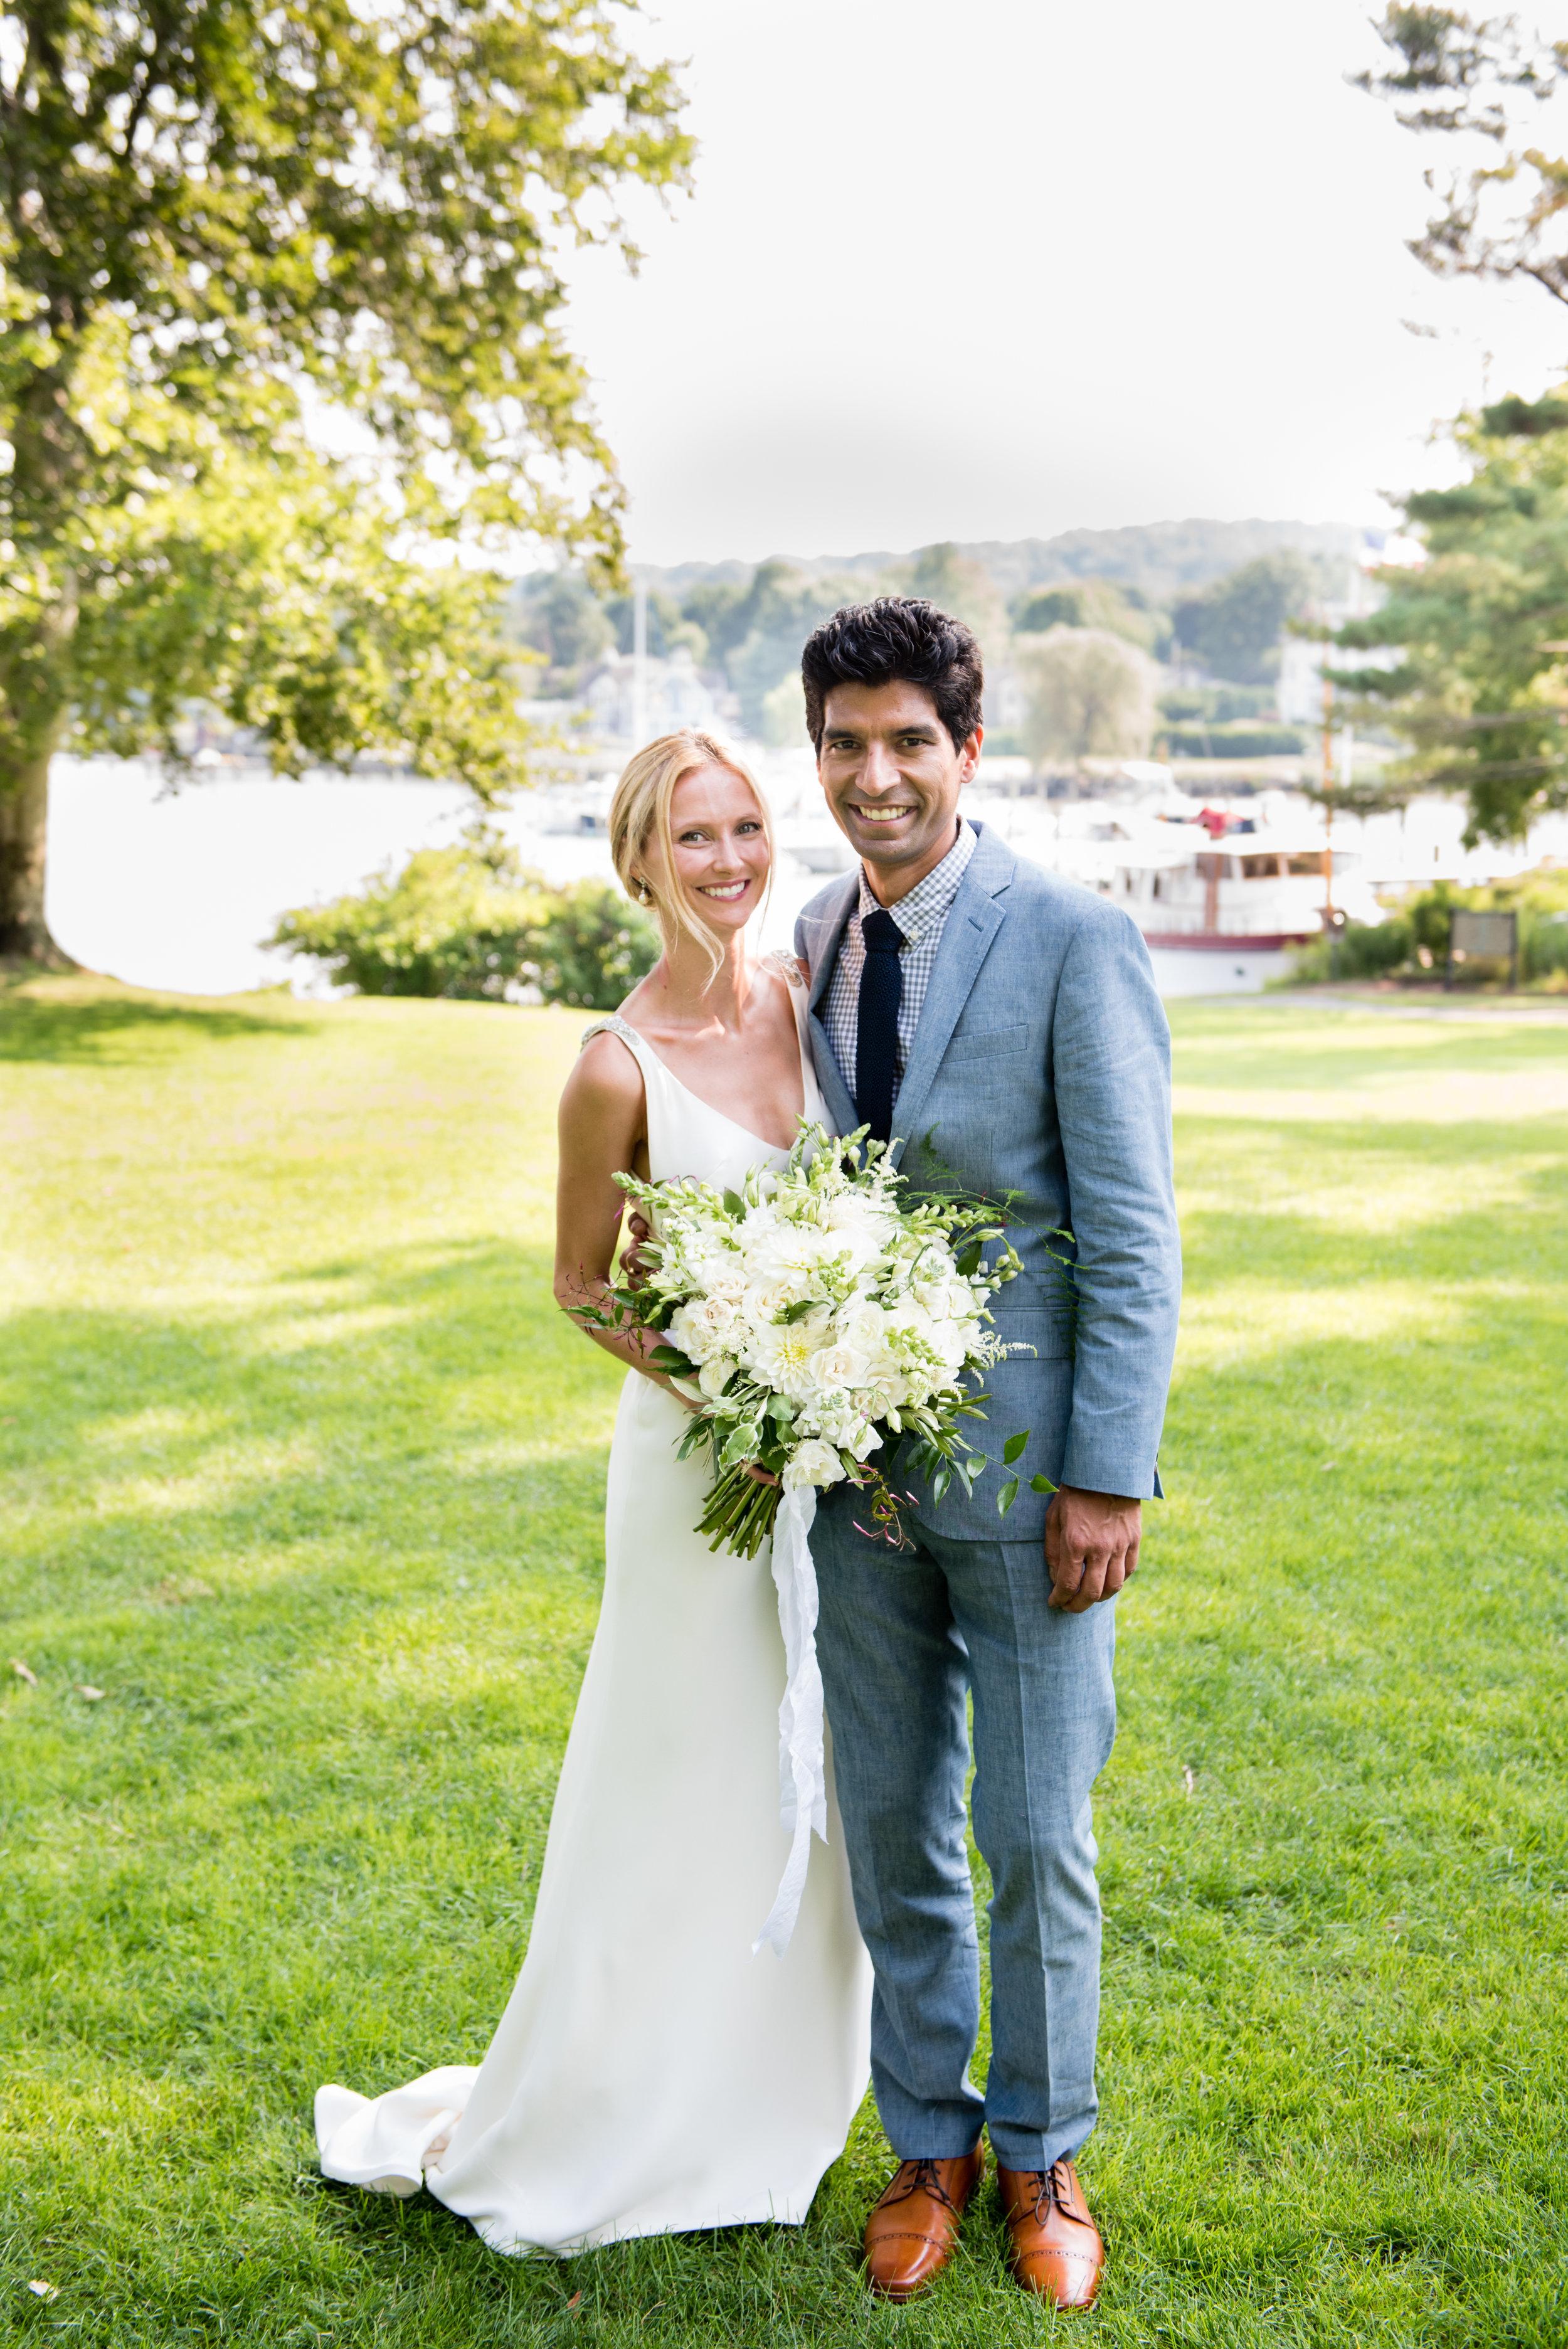 erica_shantanu_wedding-510.jpg